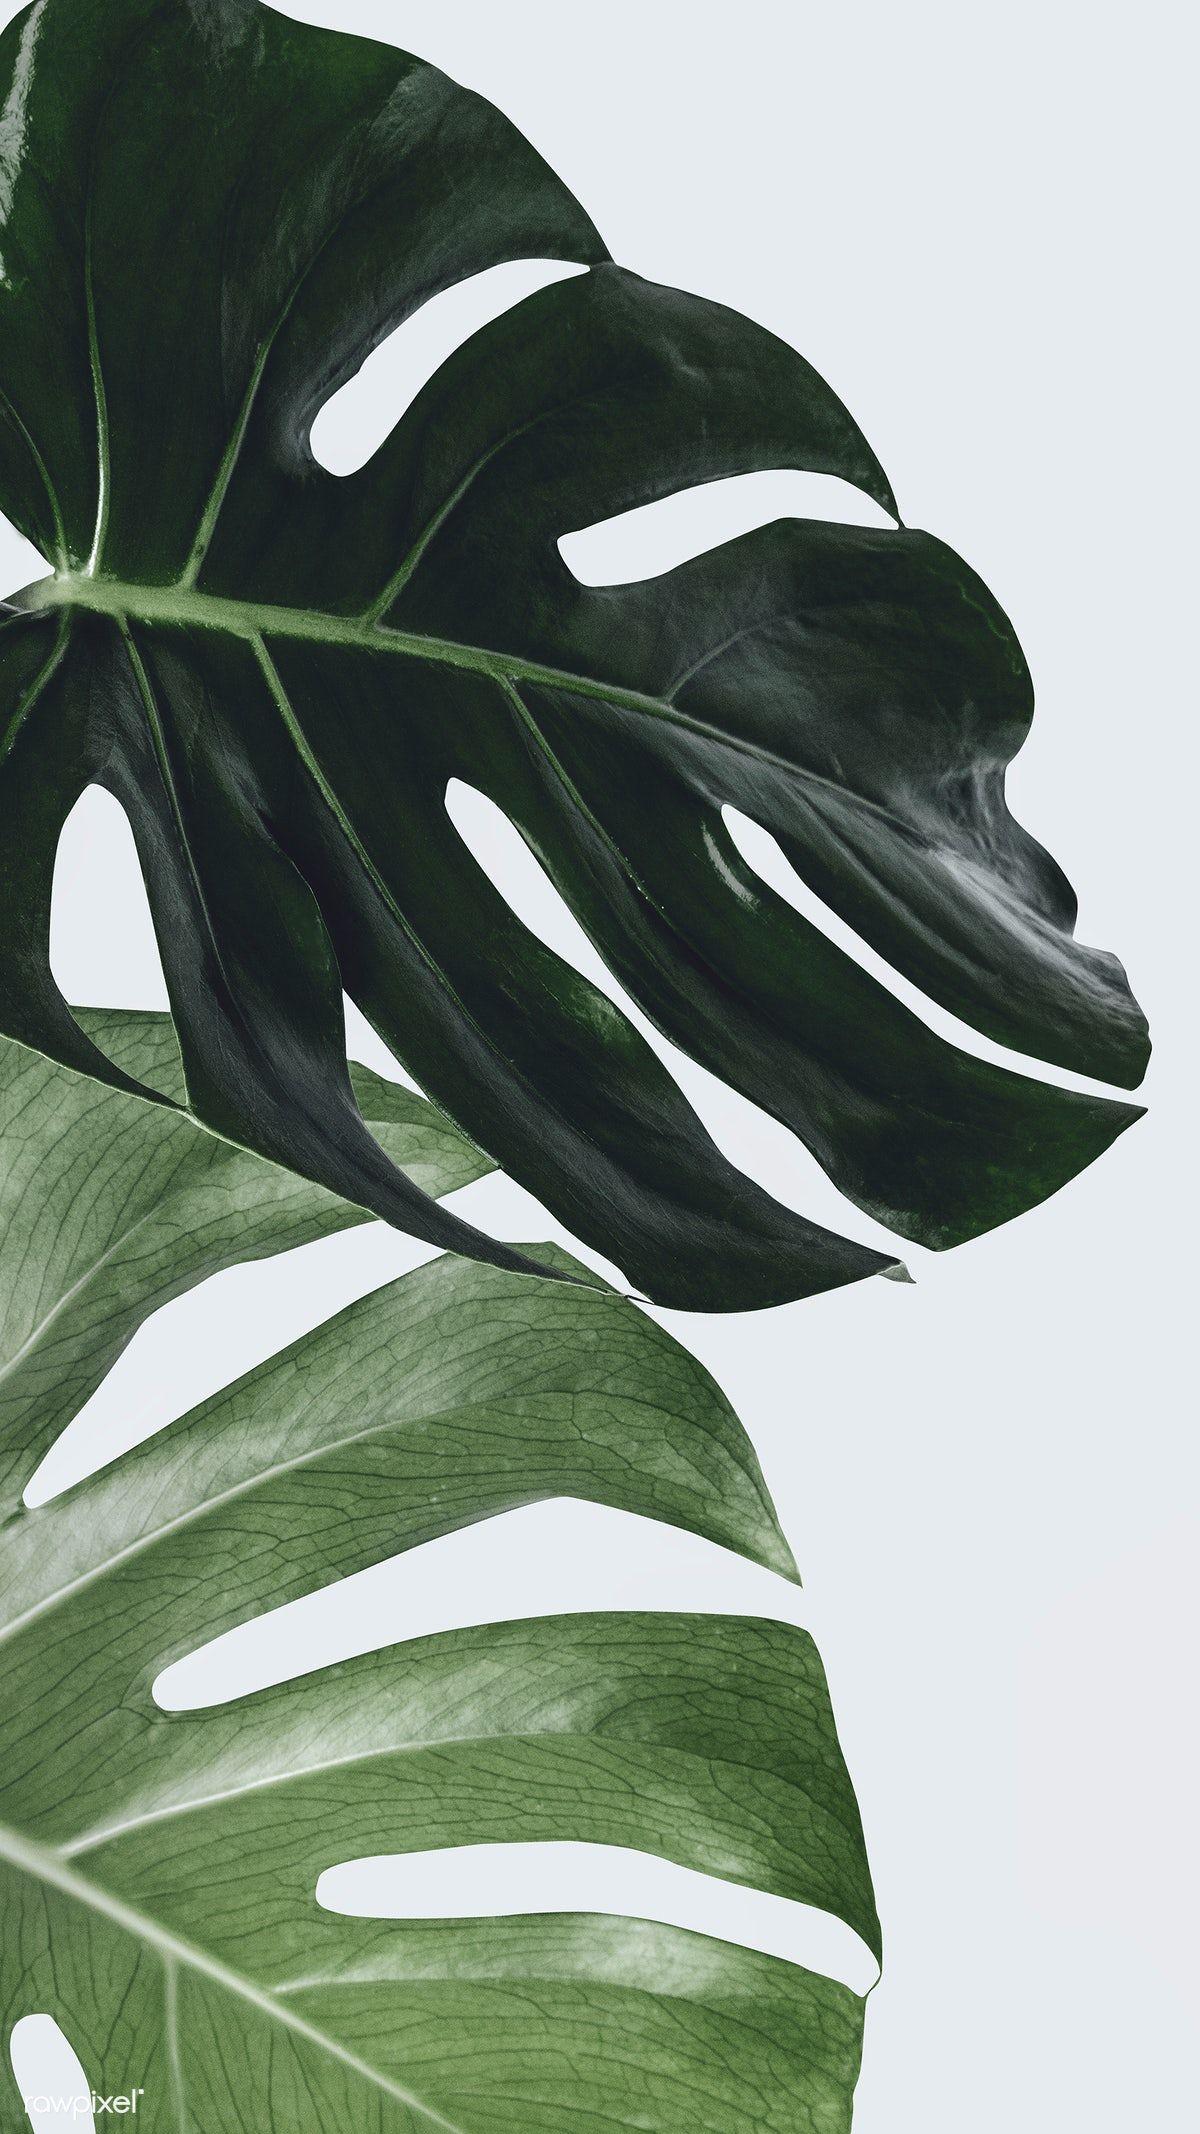 Download Premium Image Of Monstera Plant Leaf Wall Art 2259878 Leaf Wall Art Iphone Wallpaper Plants Plant Wallpaper